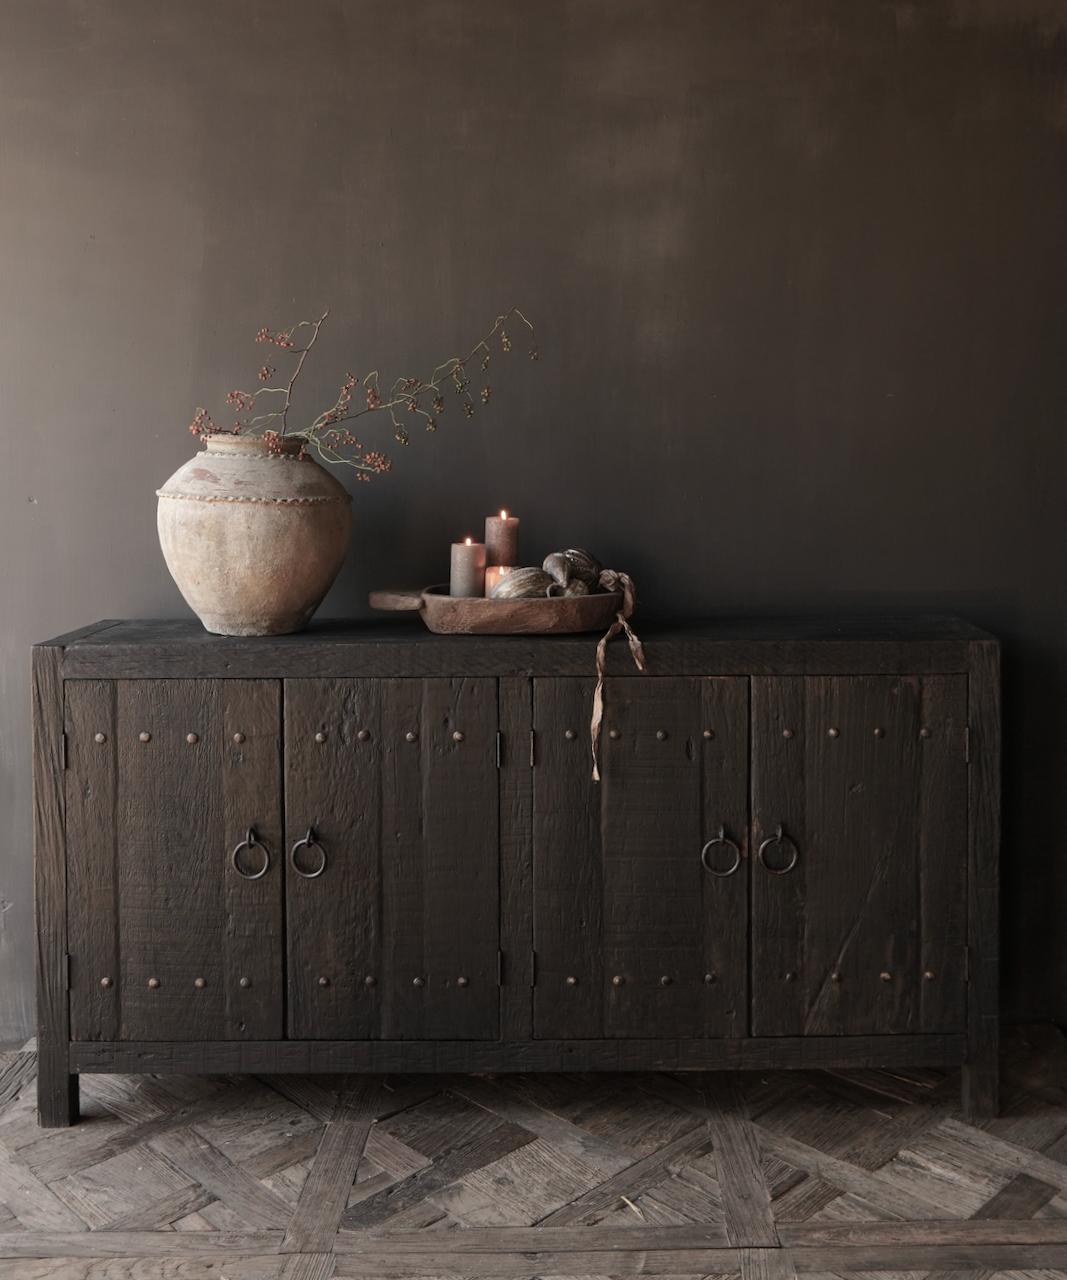 TV-Schrank / Sideboard aus altem schwarz / braunem robustem Holz-1